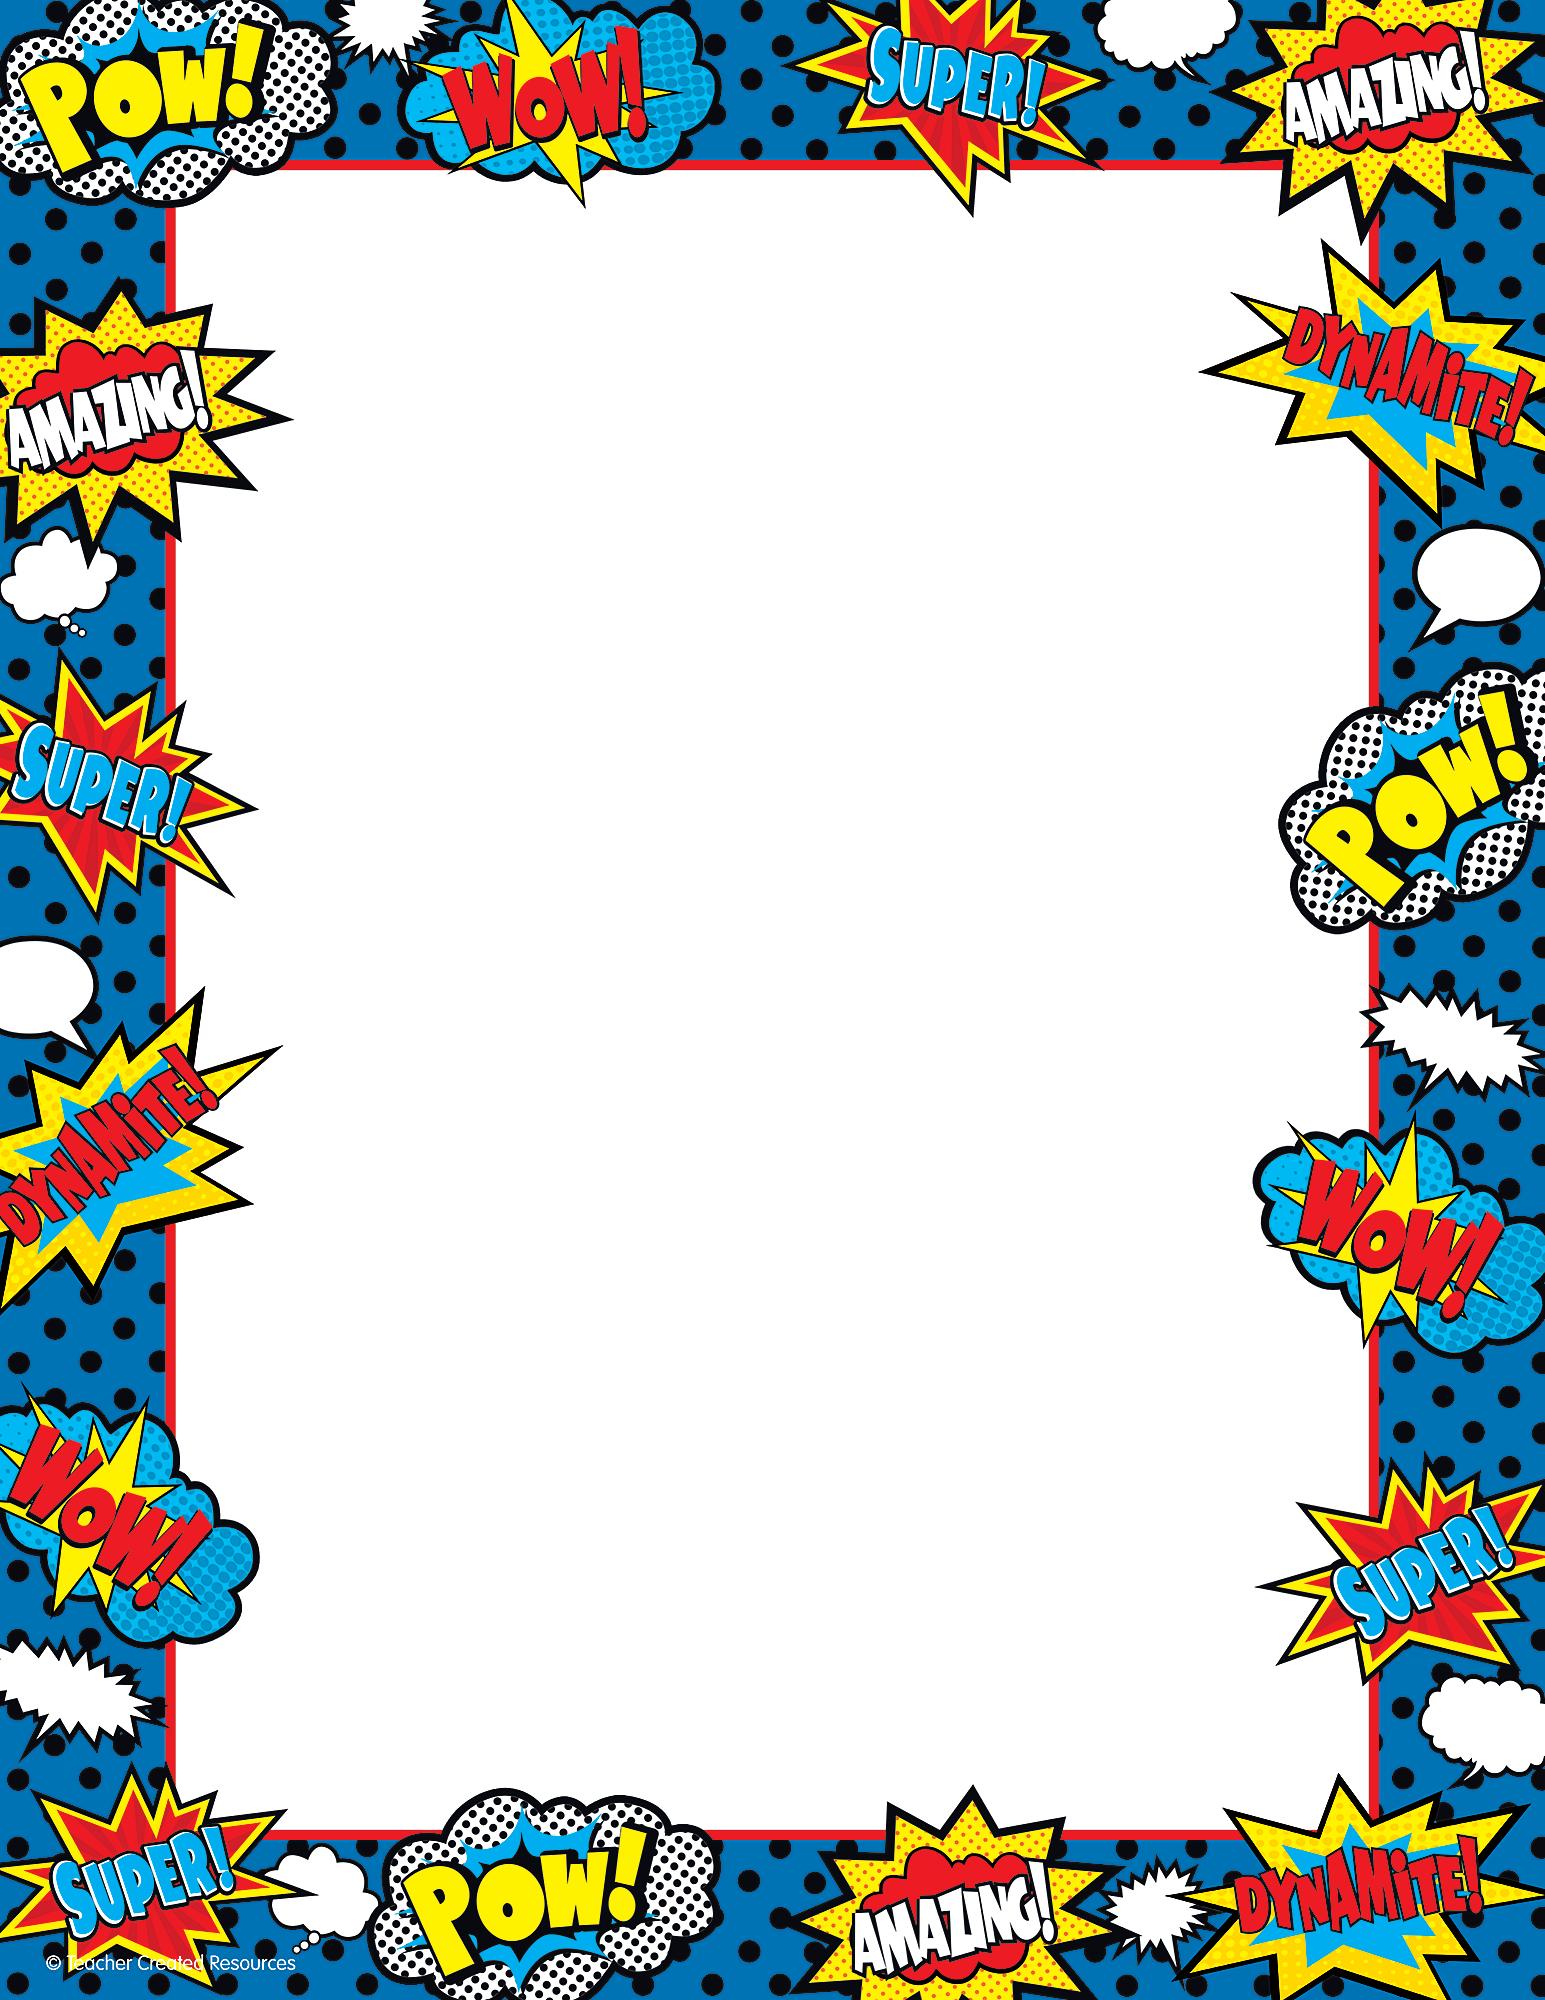 Superhero Computer Paper | Pinterest | Superhéroes, Cumpleaños y Cumple